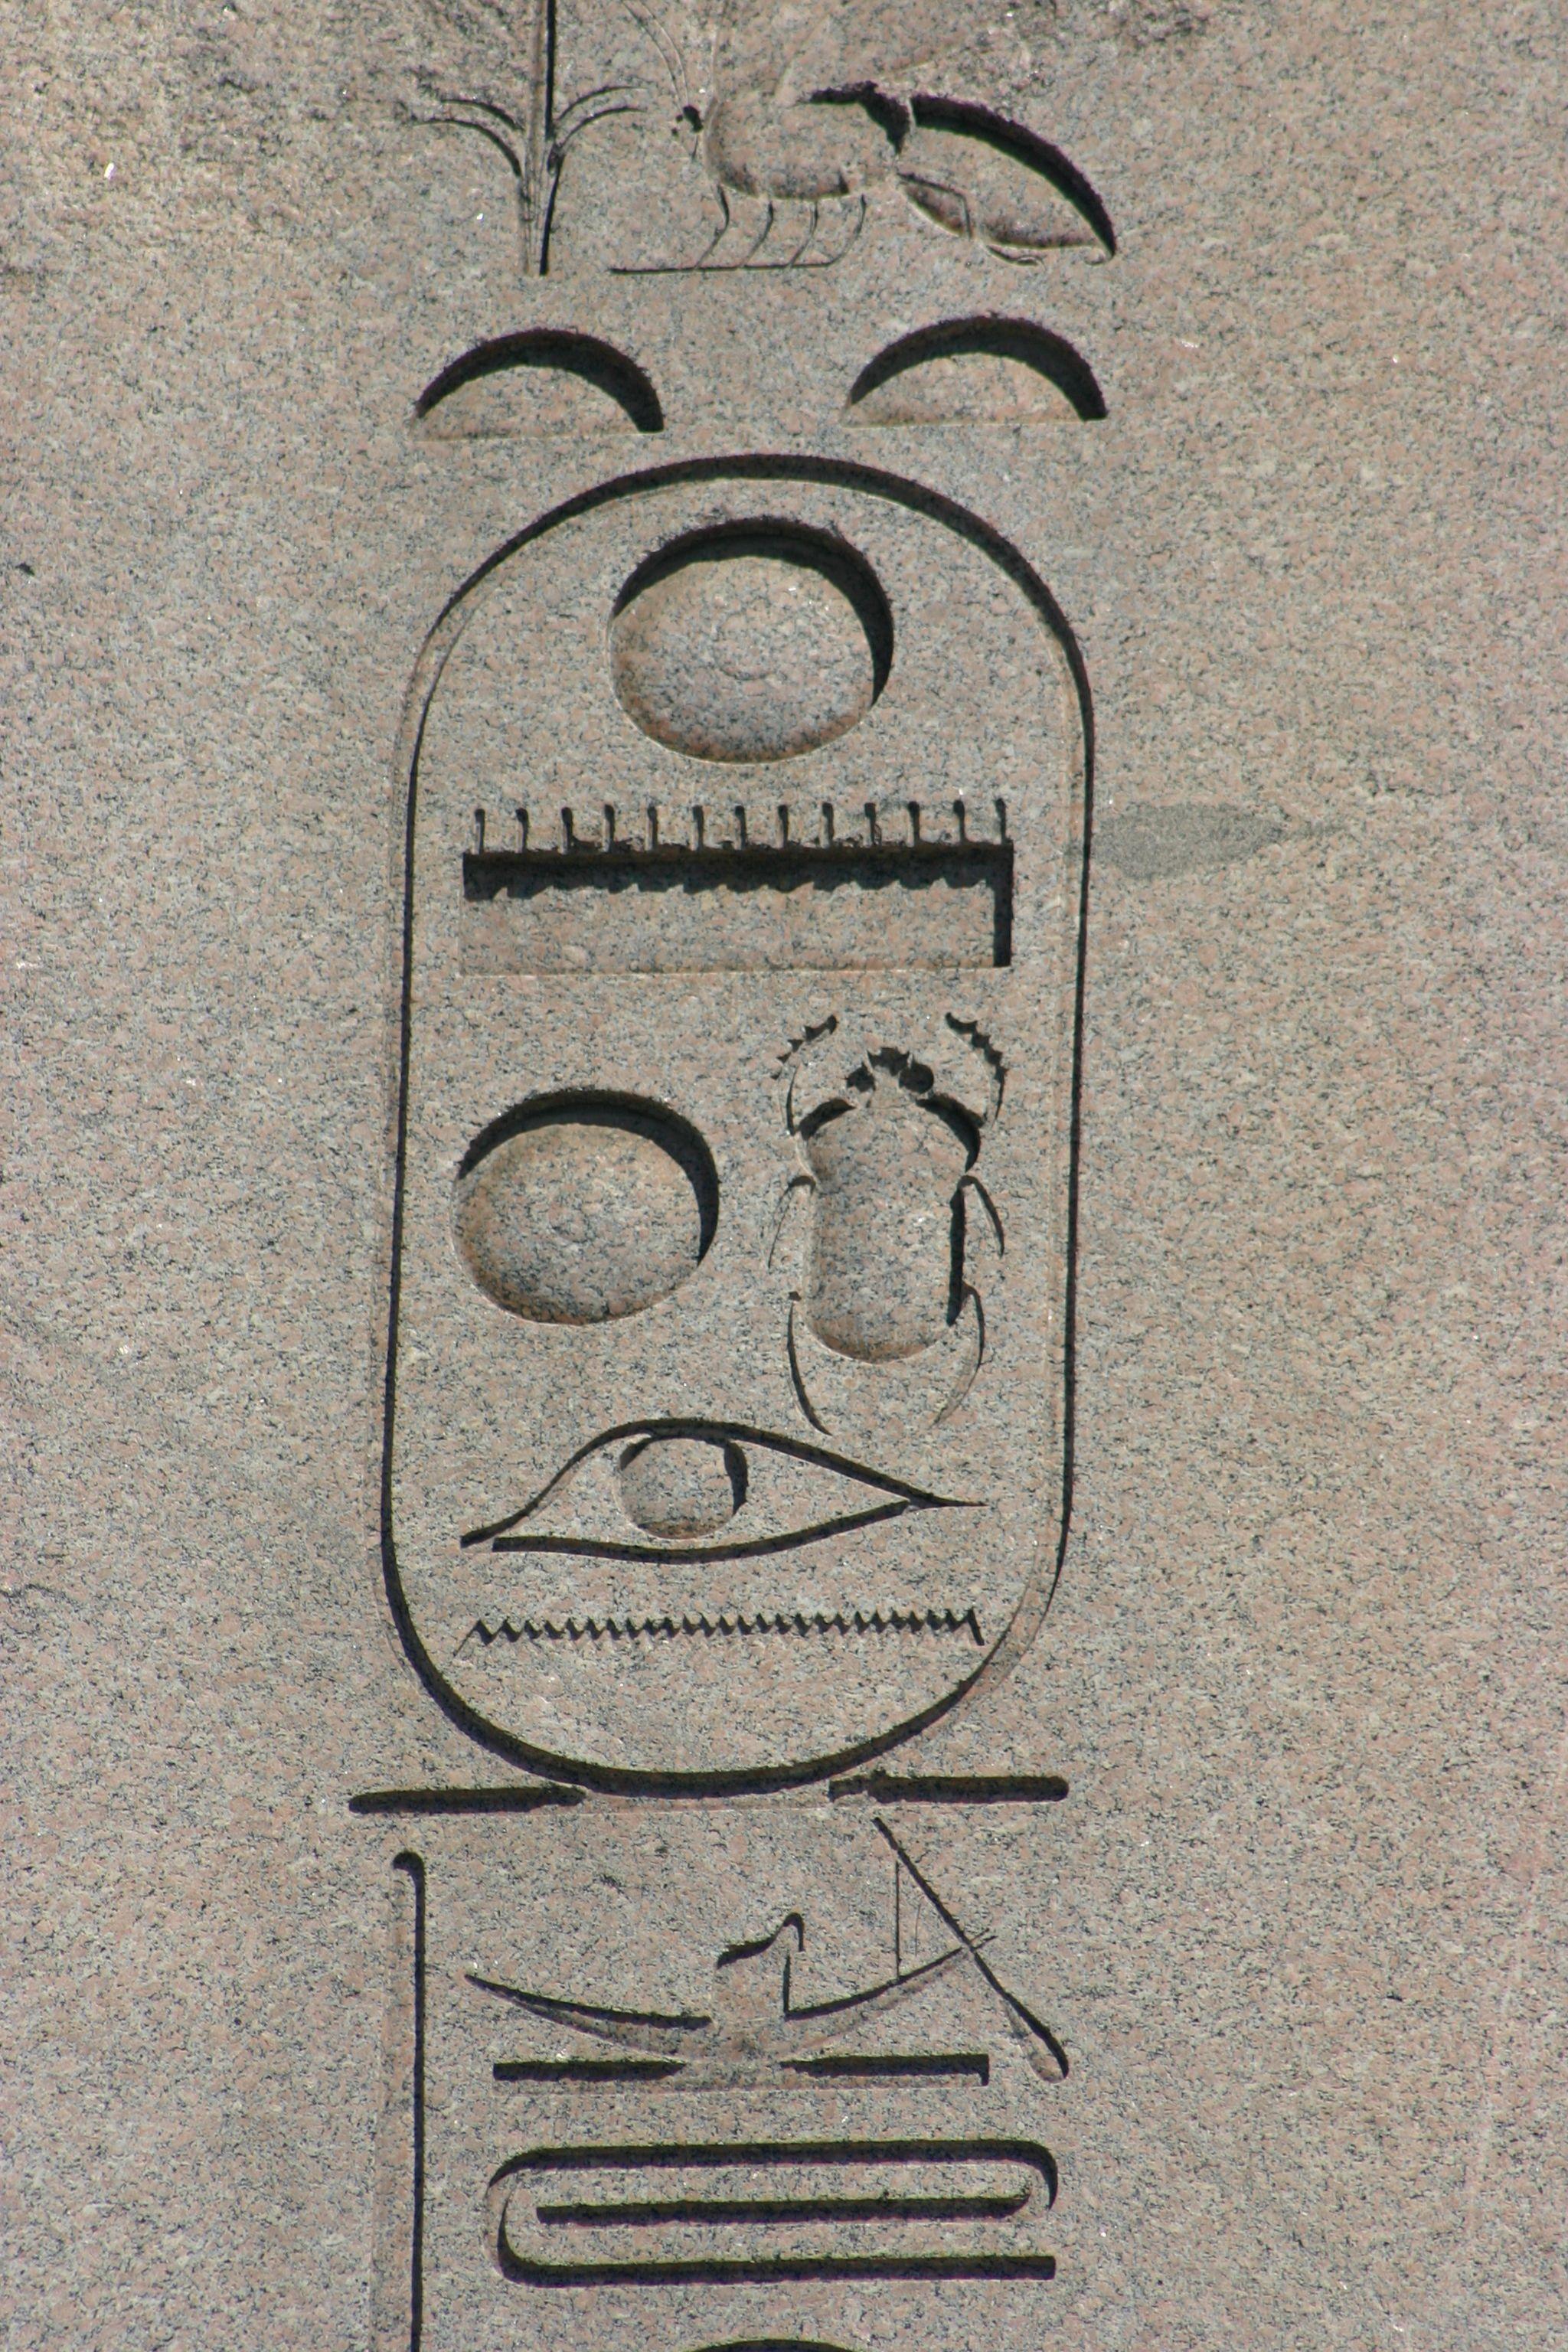 Shenna Cartouche Of Nesi Pharaoh Thutmoses Iii 18th